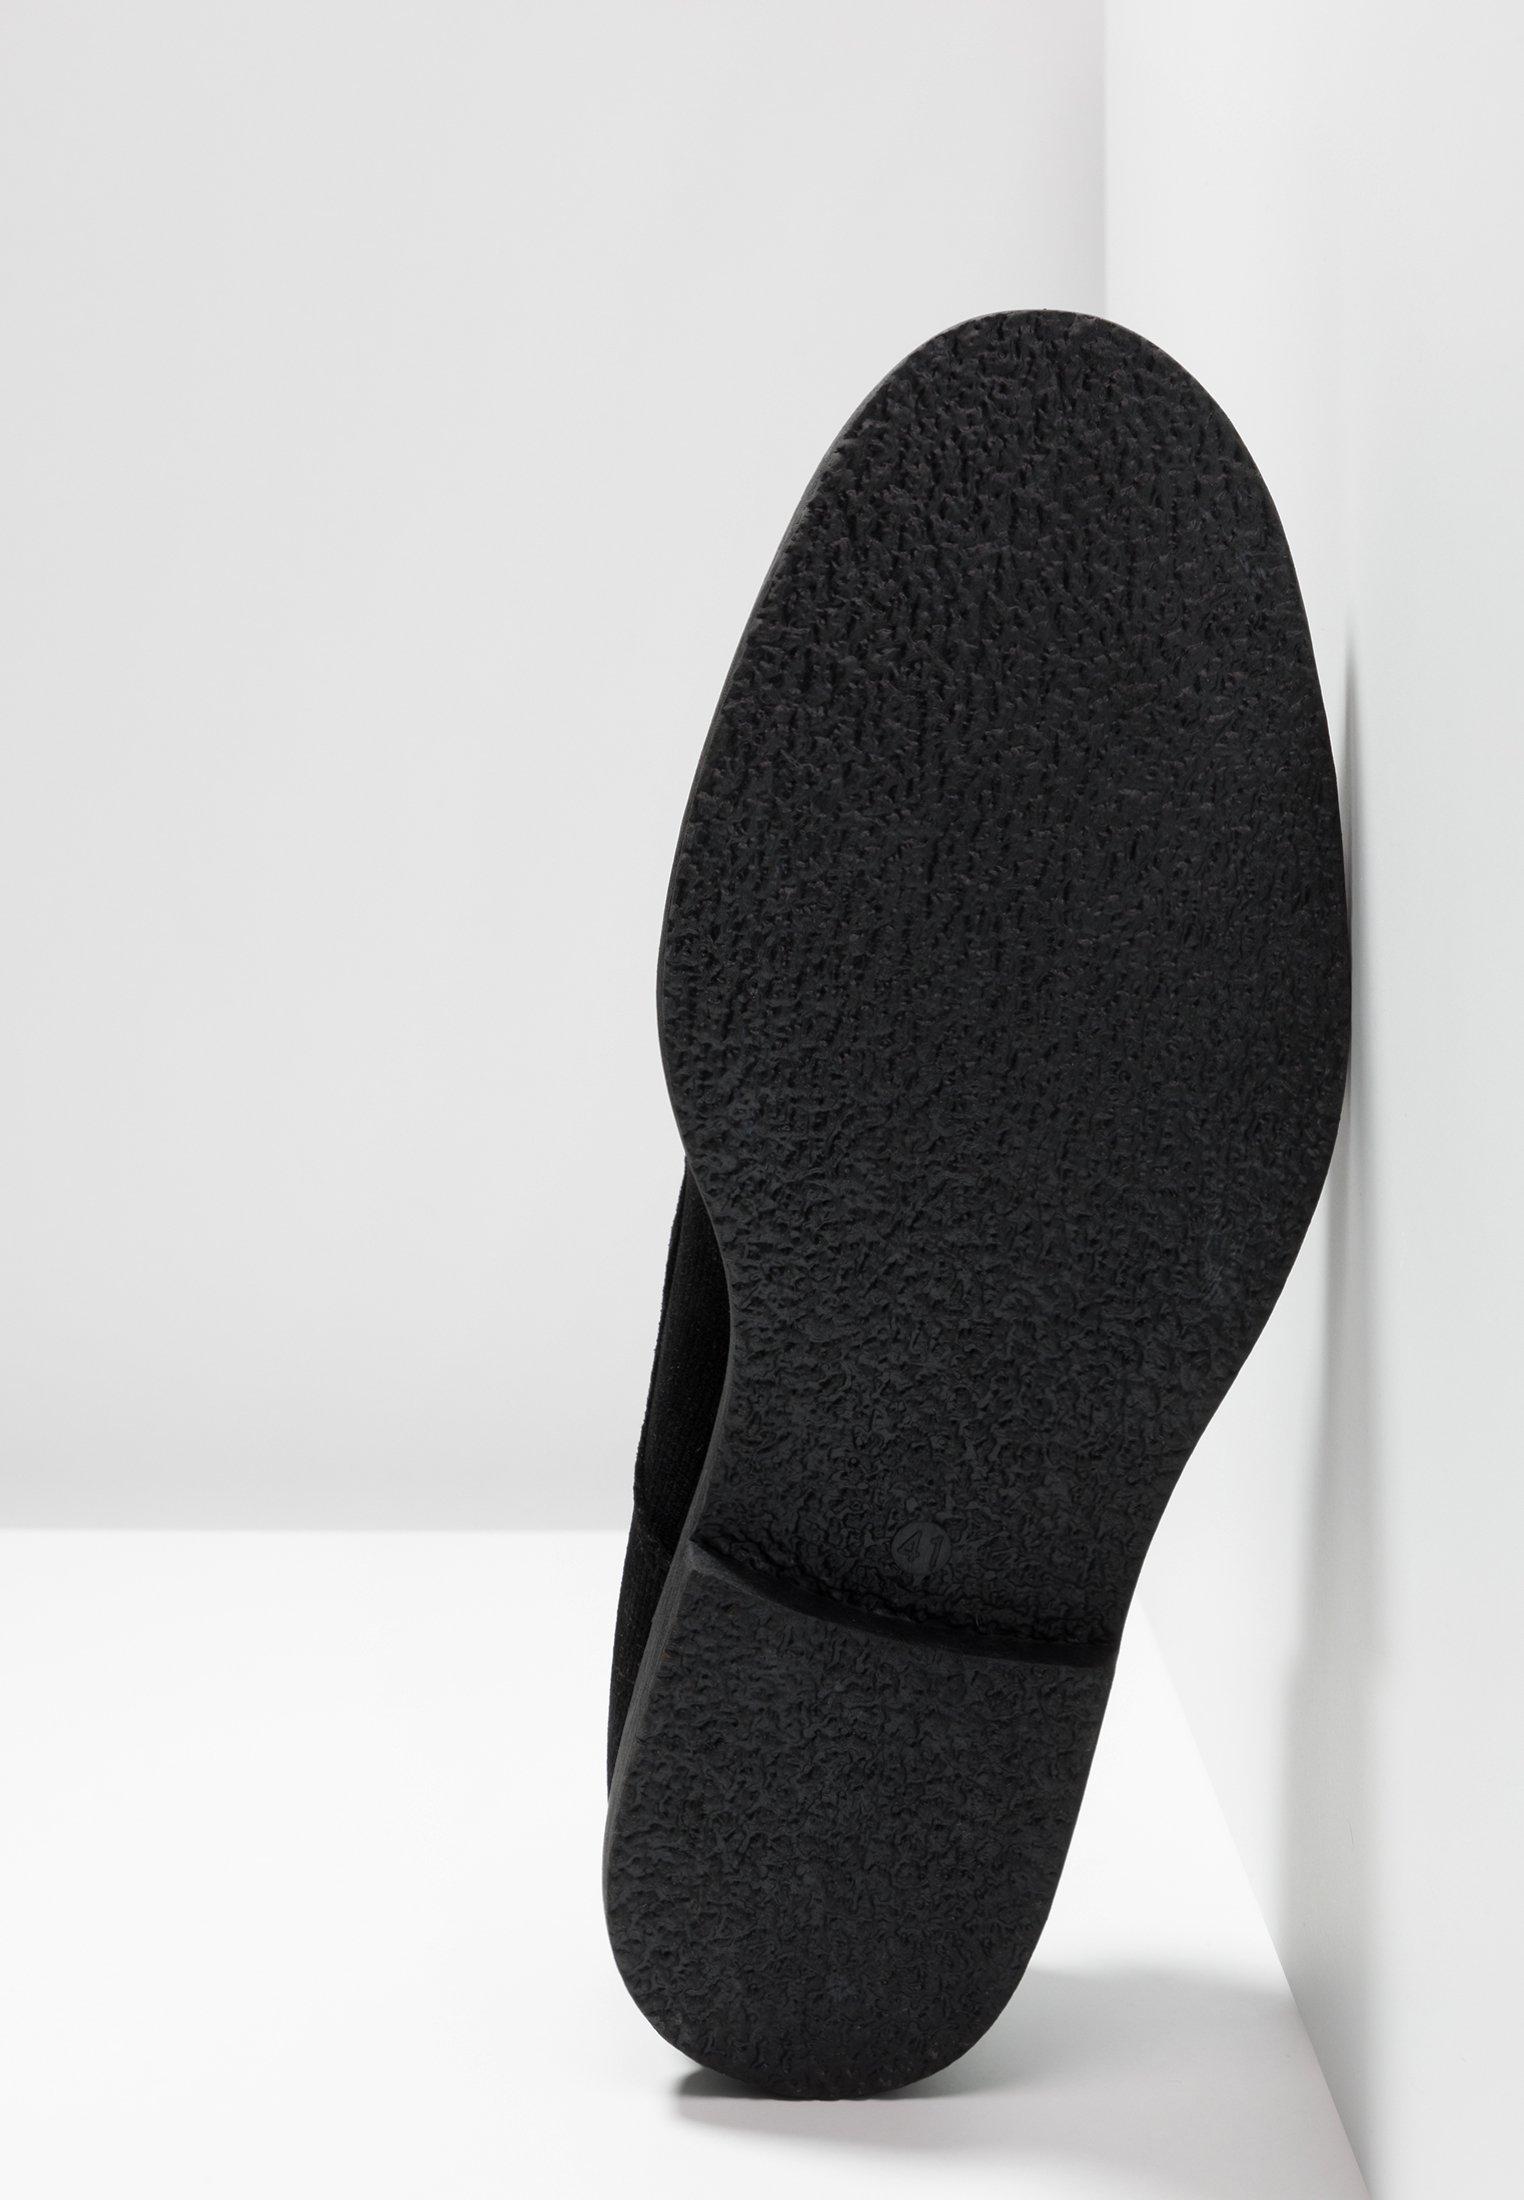 Topman SPARK - Eleganta snörskor - black/svart - Herrskor M9Jca